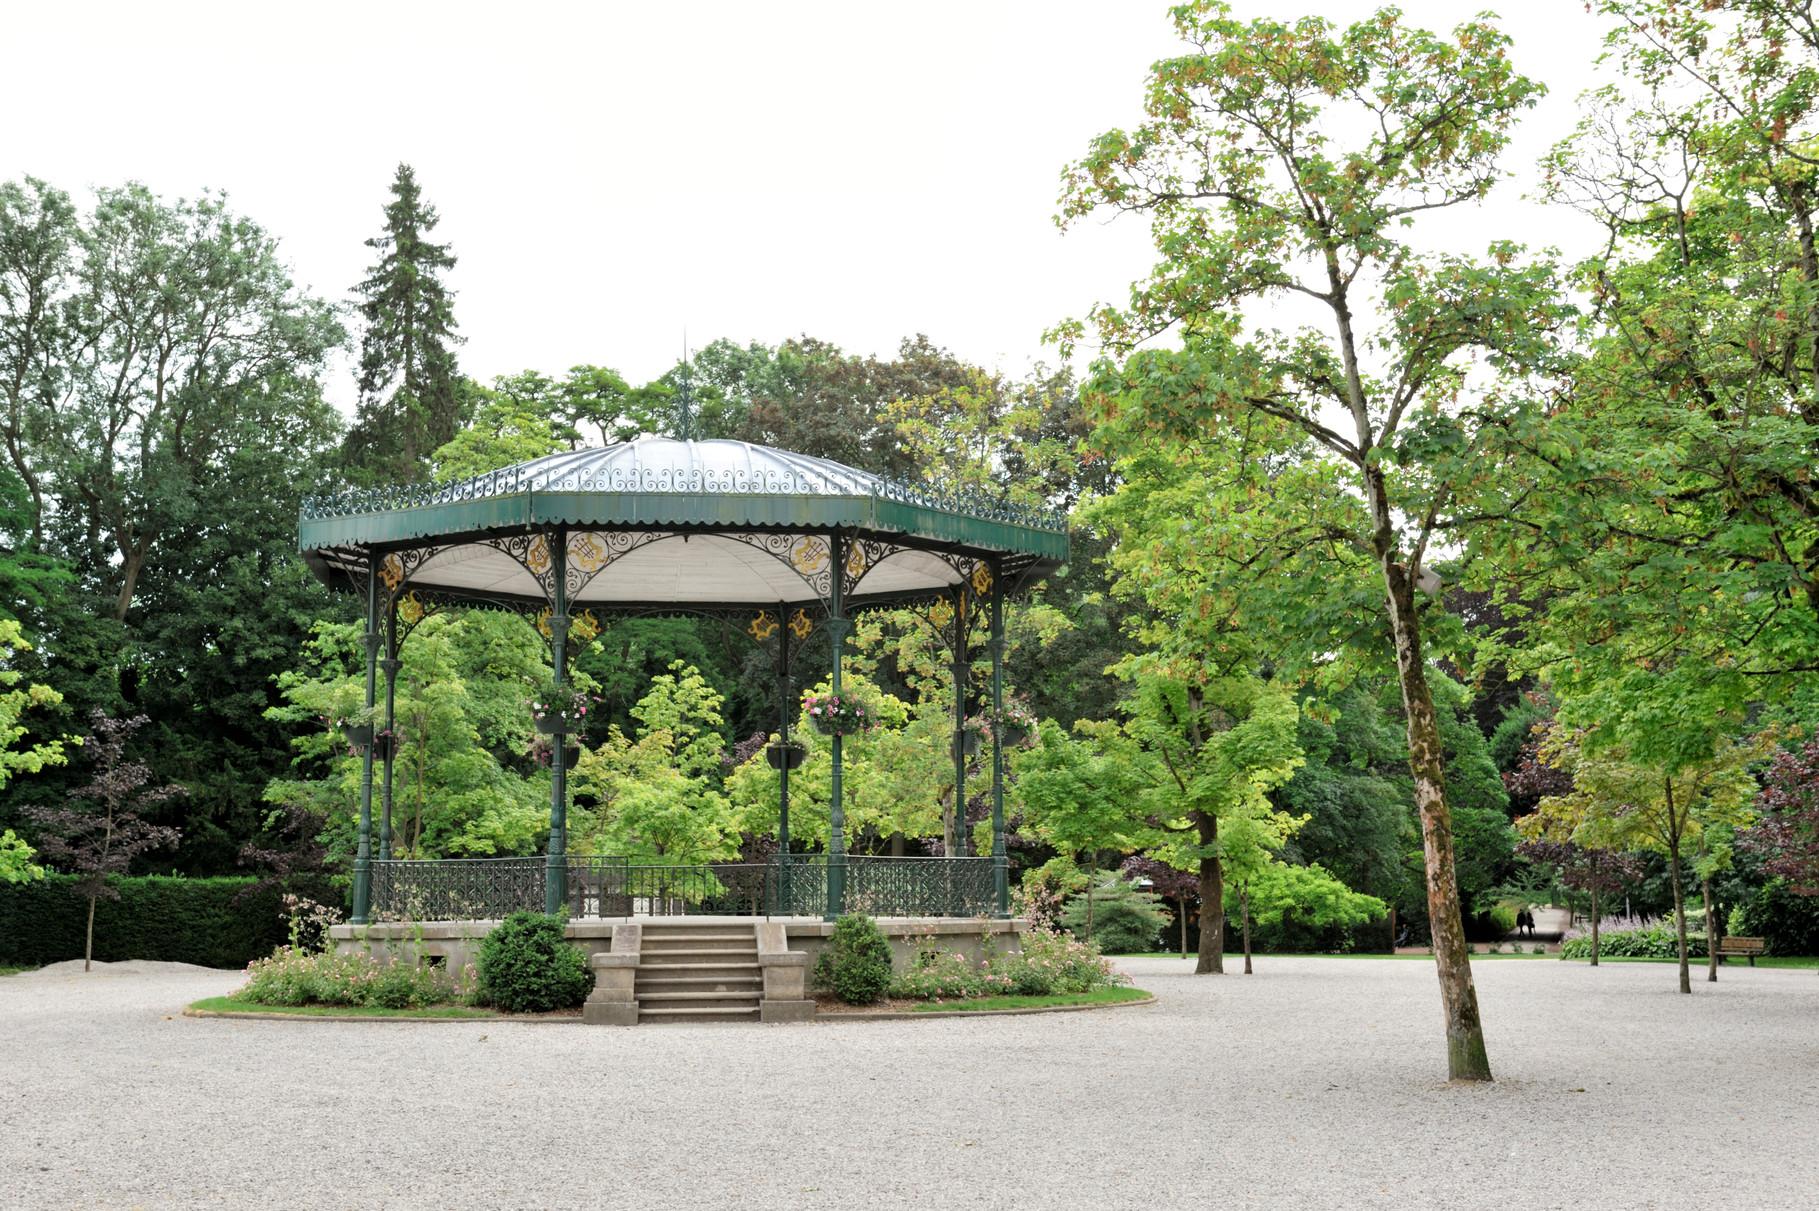 Jardin Public de Saint-Omer par Richard Soberka